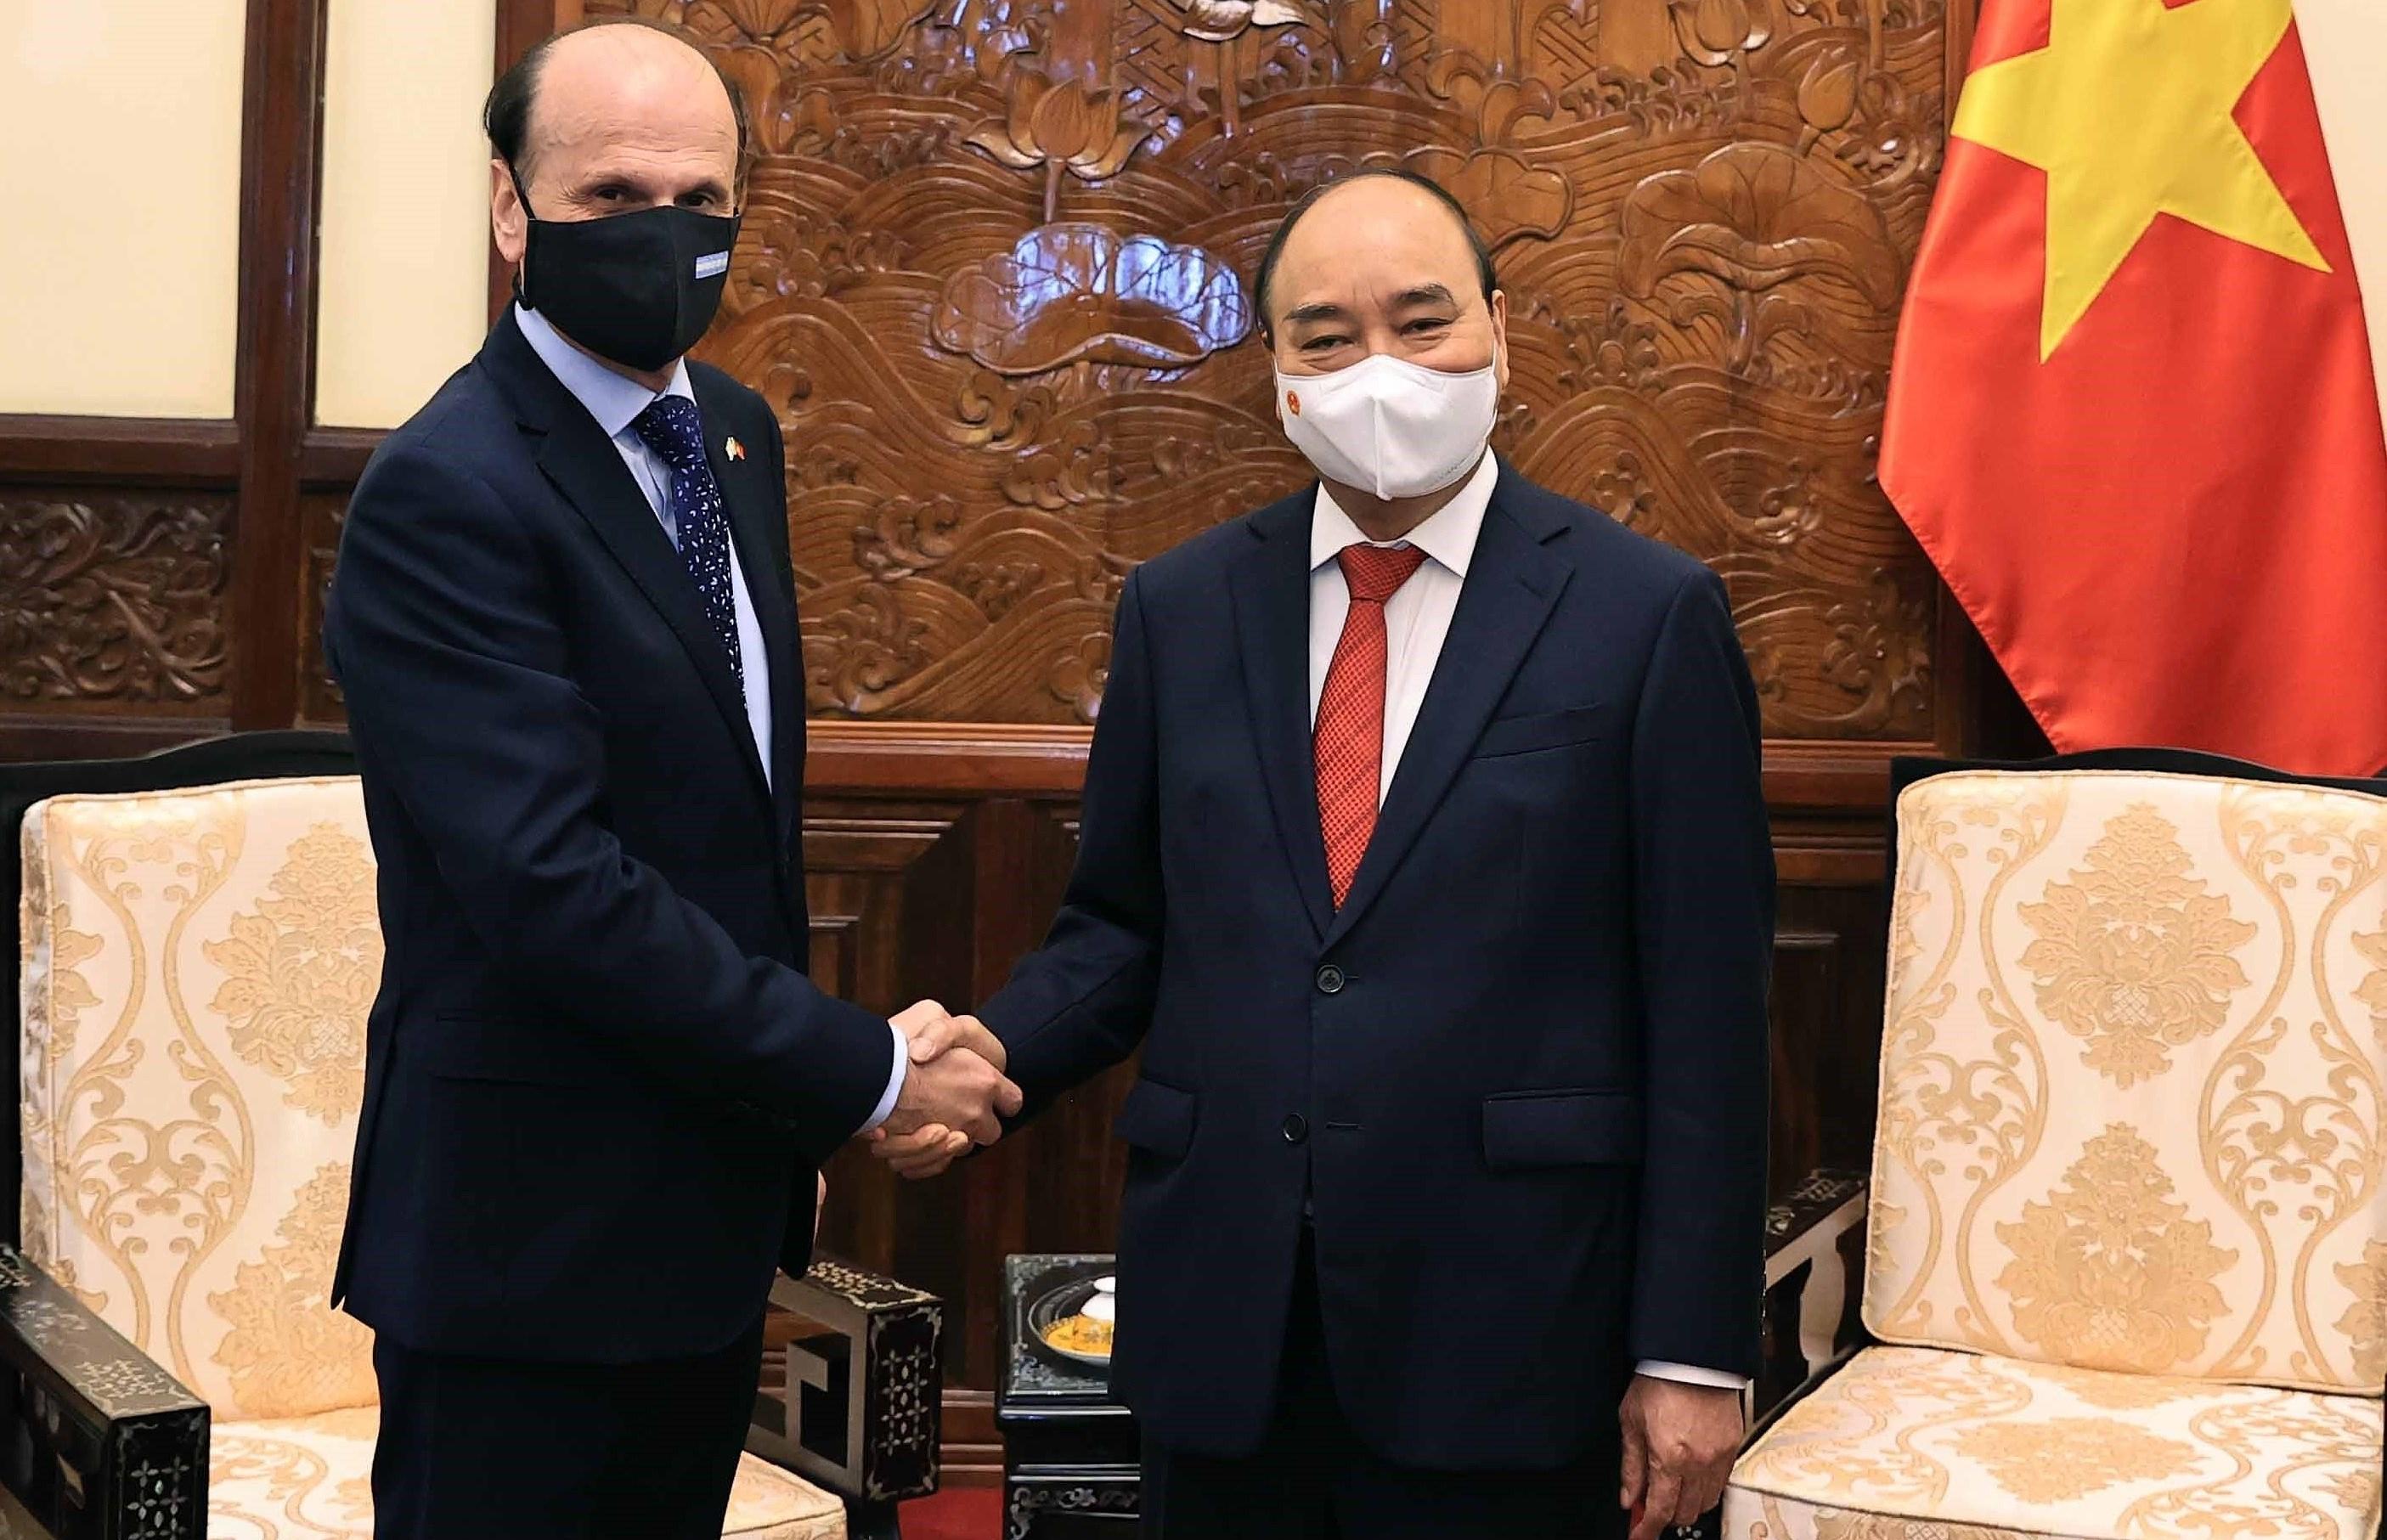 Argentina hopes for strategic partnership with Vietnam: ambassador hinh anh 2